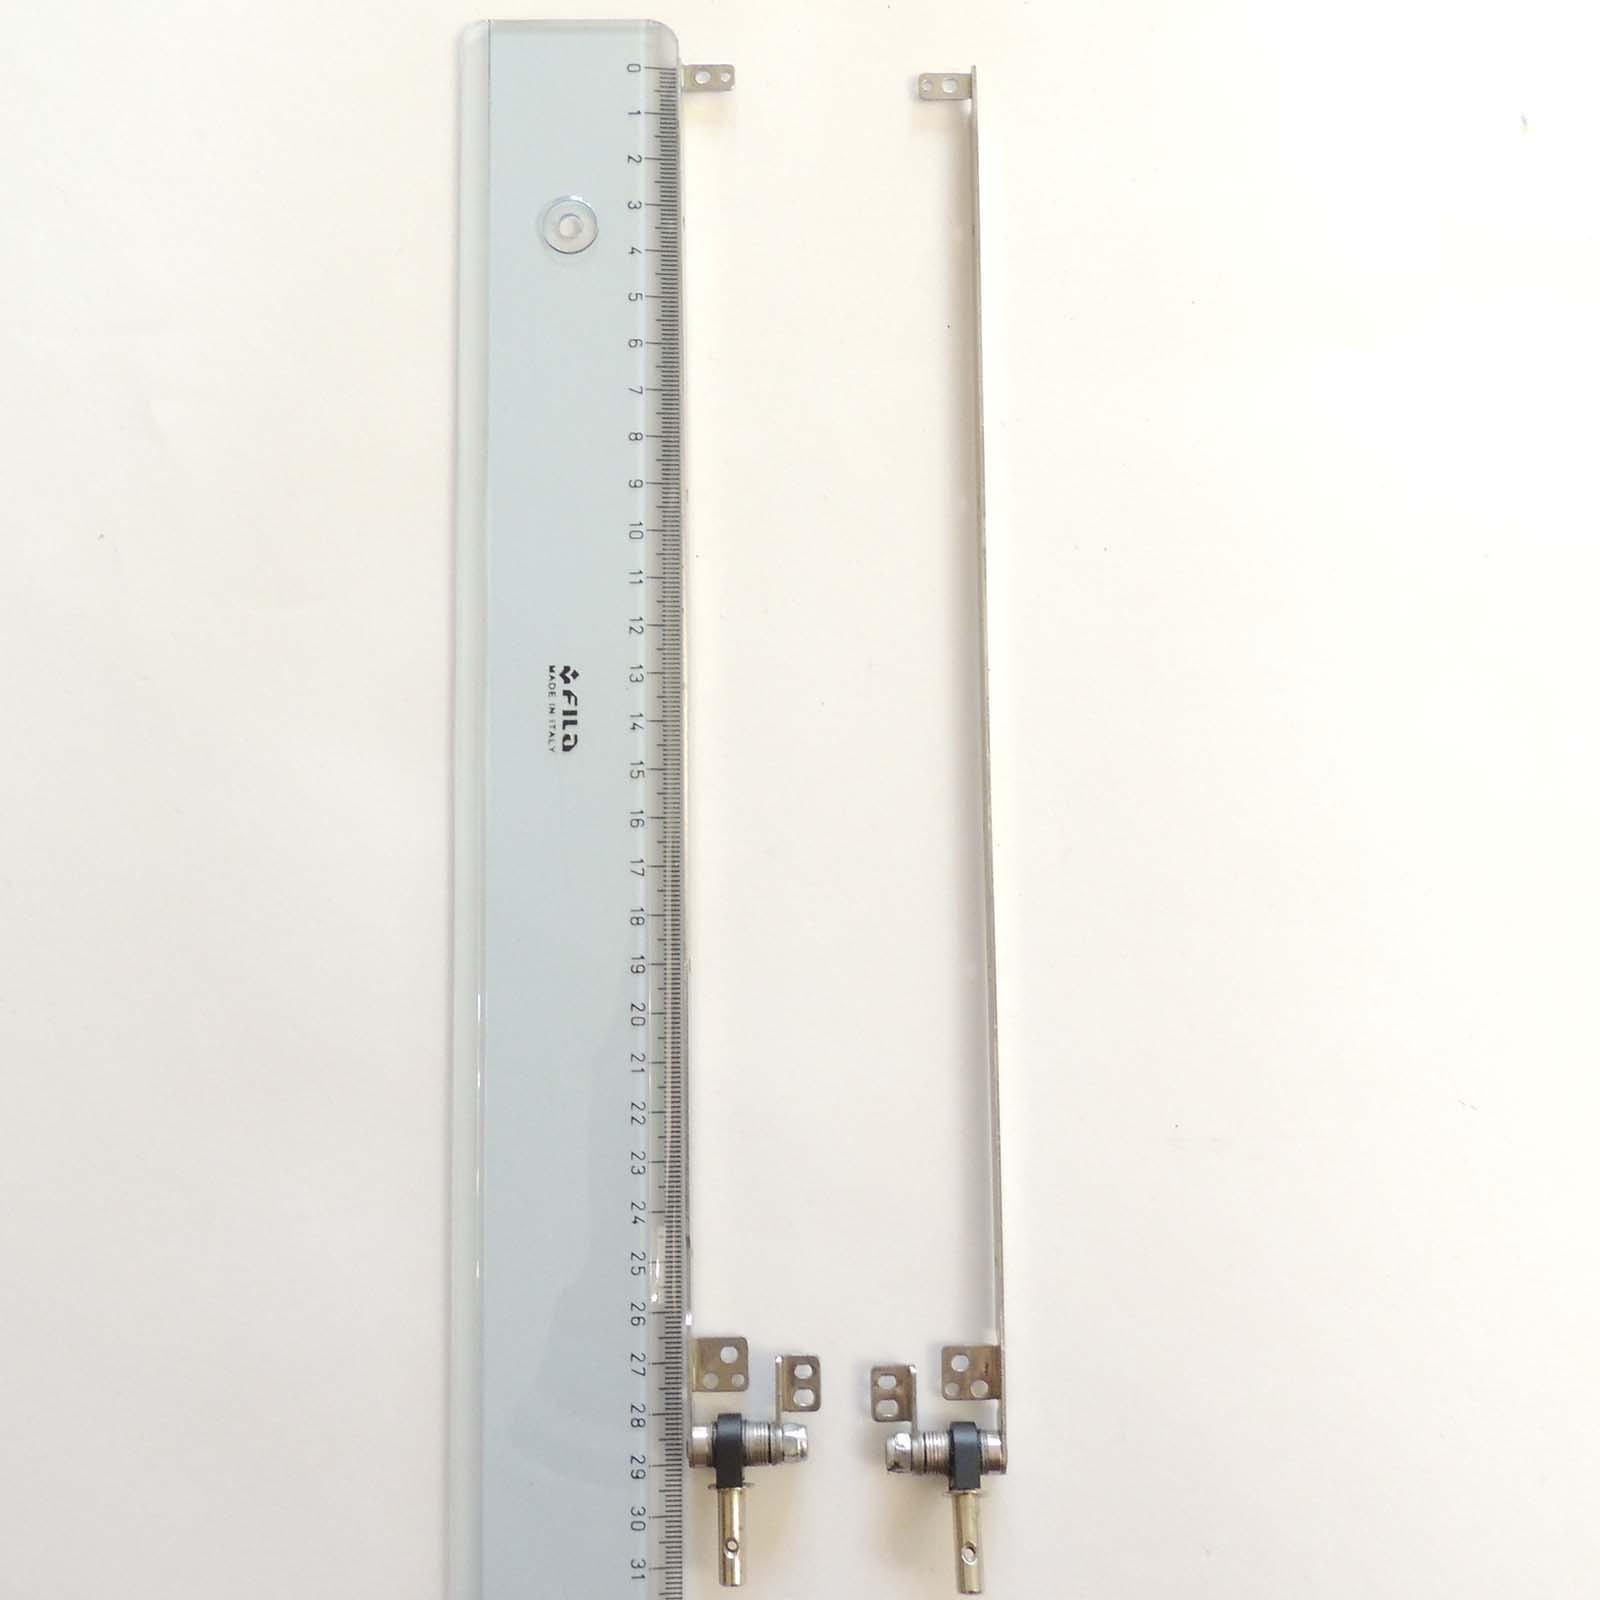 Cerniere Amilo XA2558 fujitsu siemens 24-87462-50 cjc supporti LCD